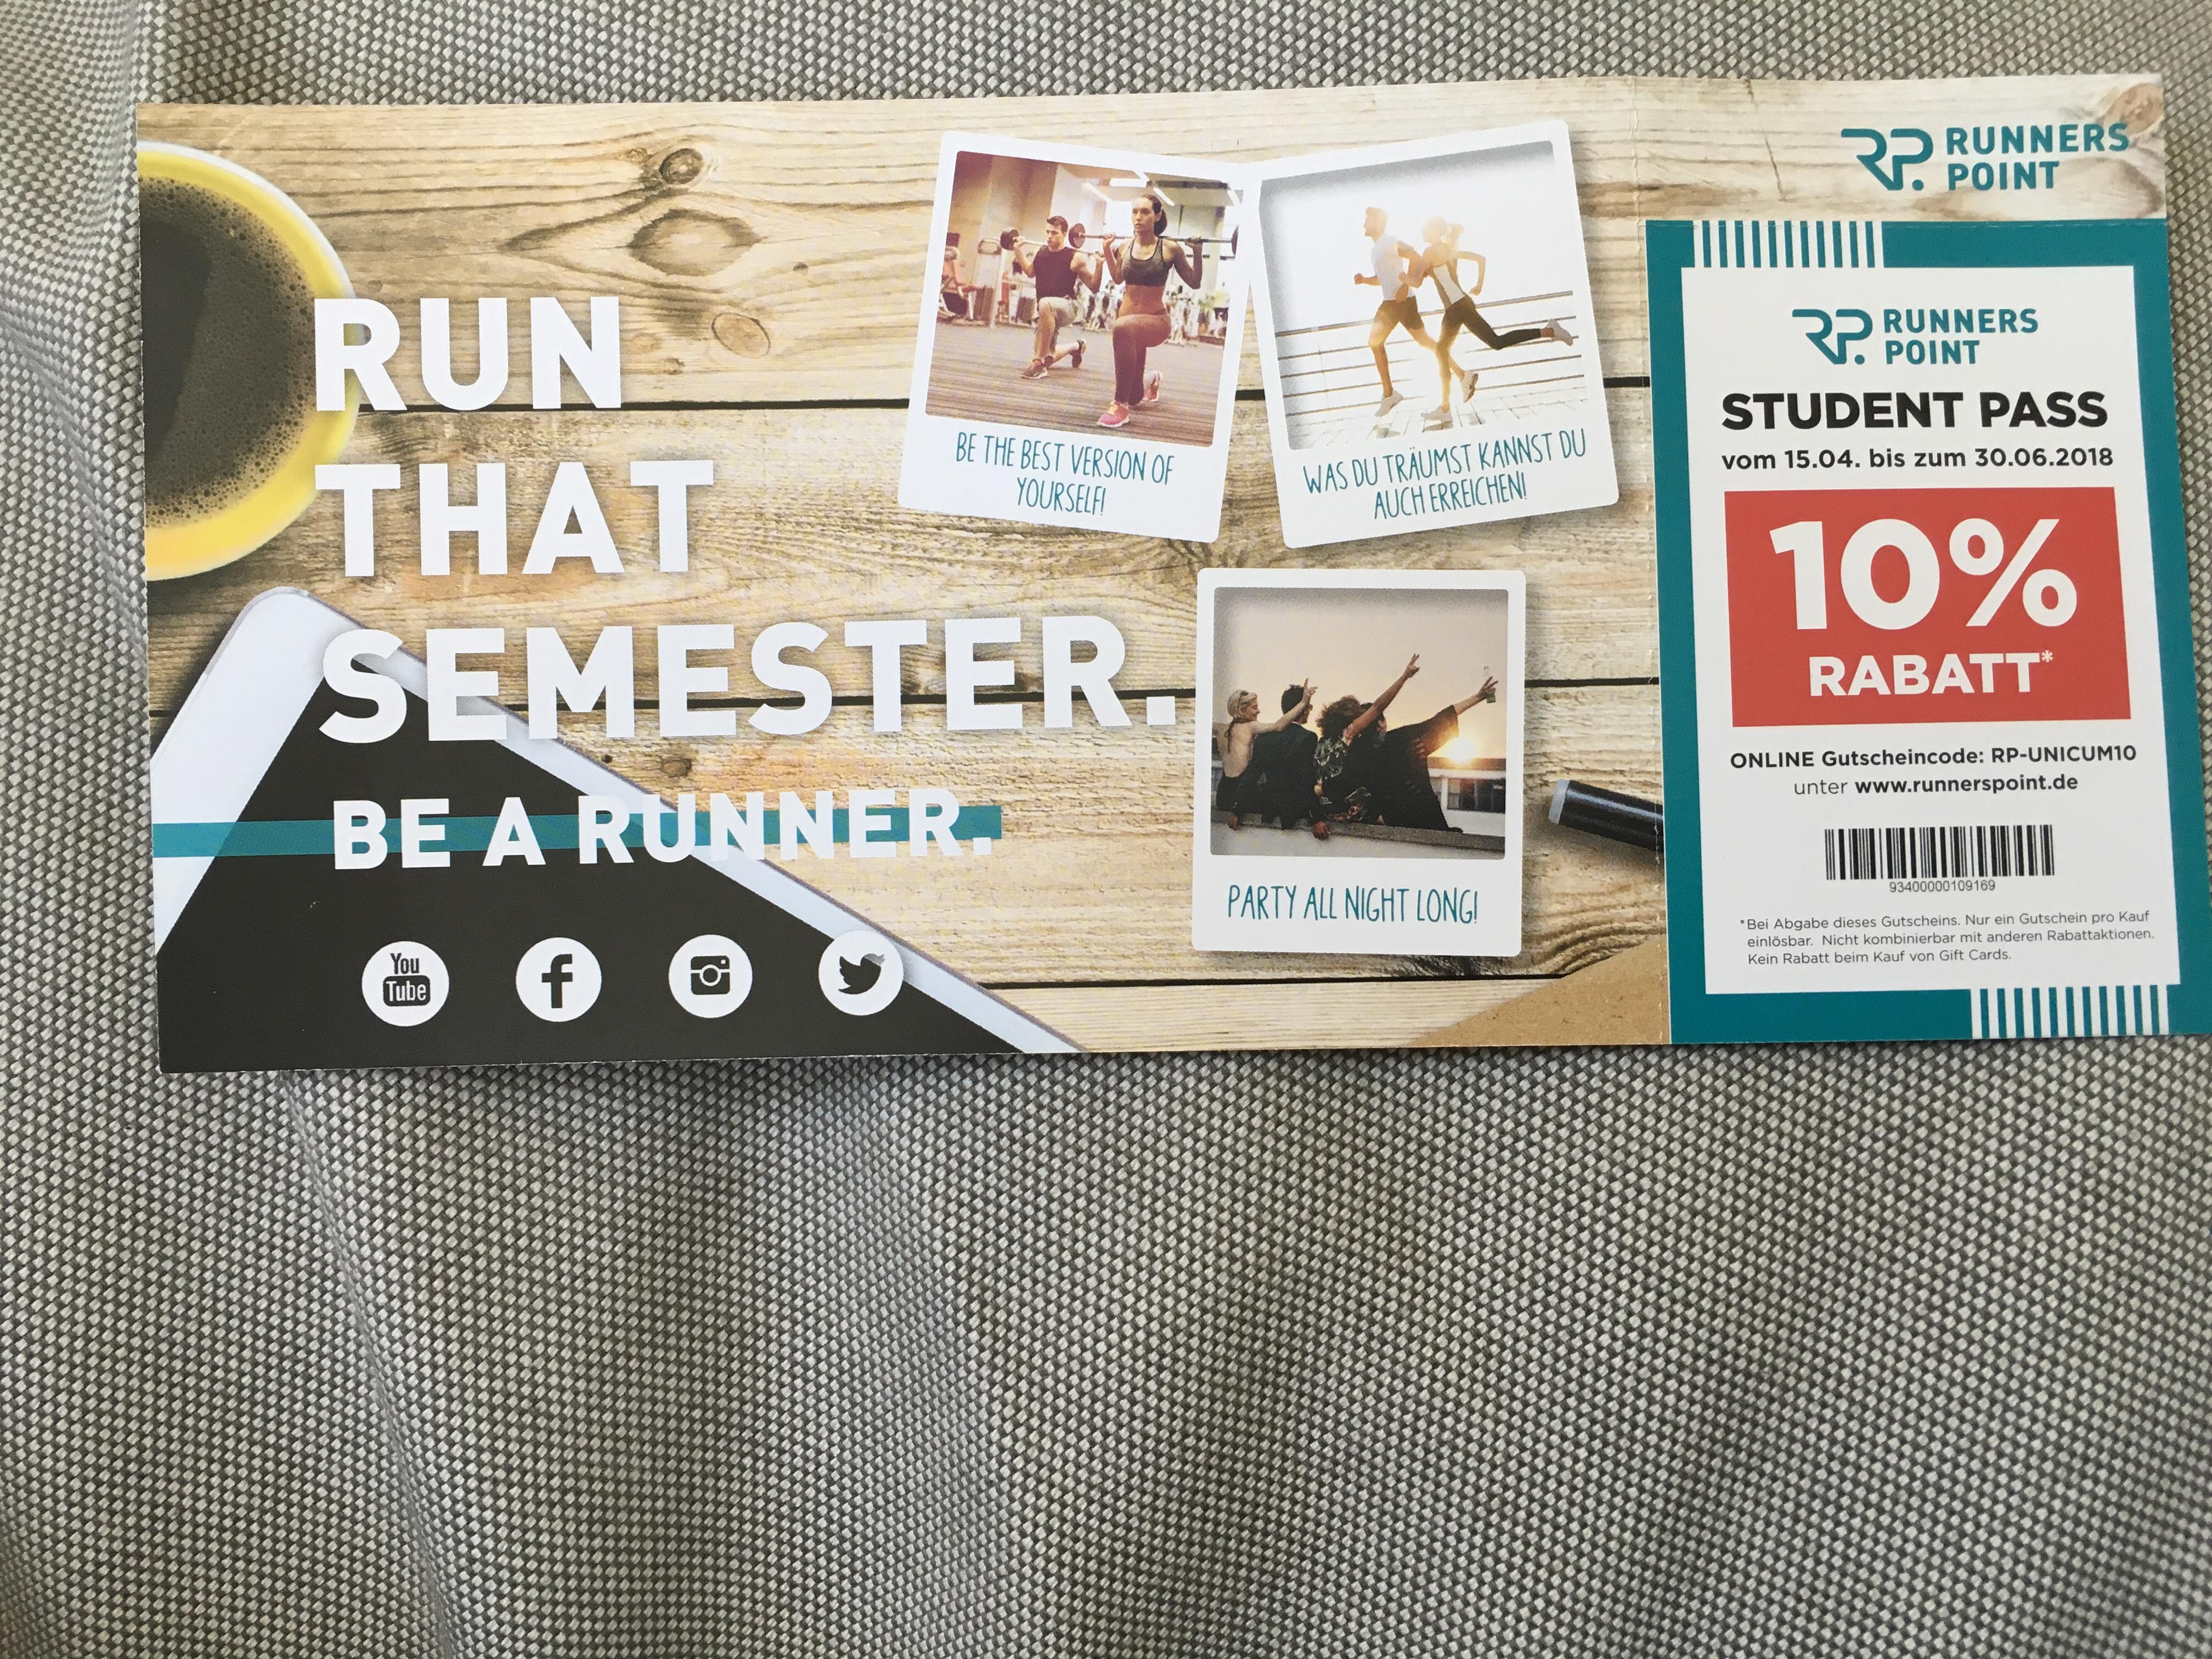 10% Rabatt bei Runnerspoint